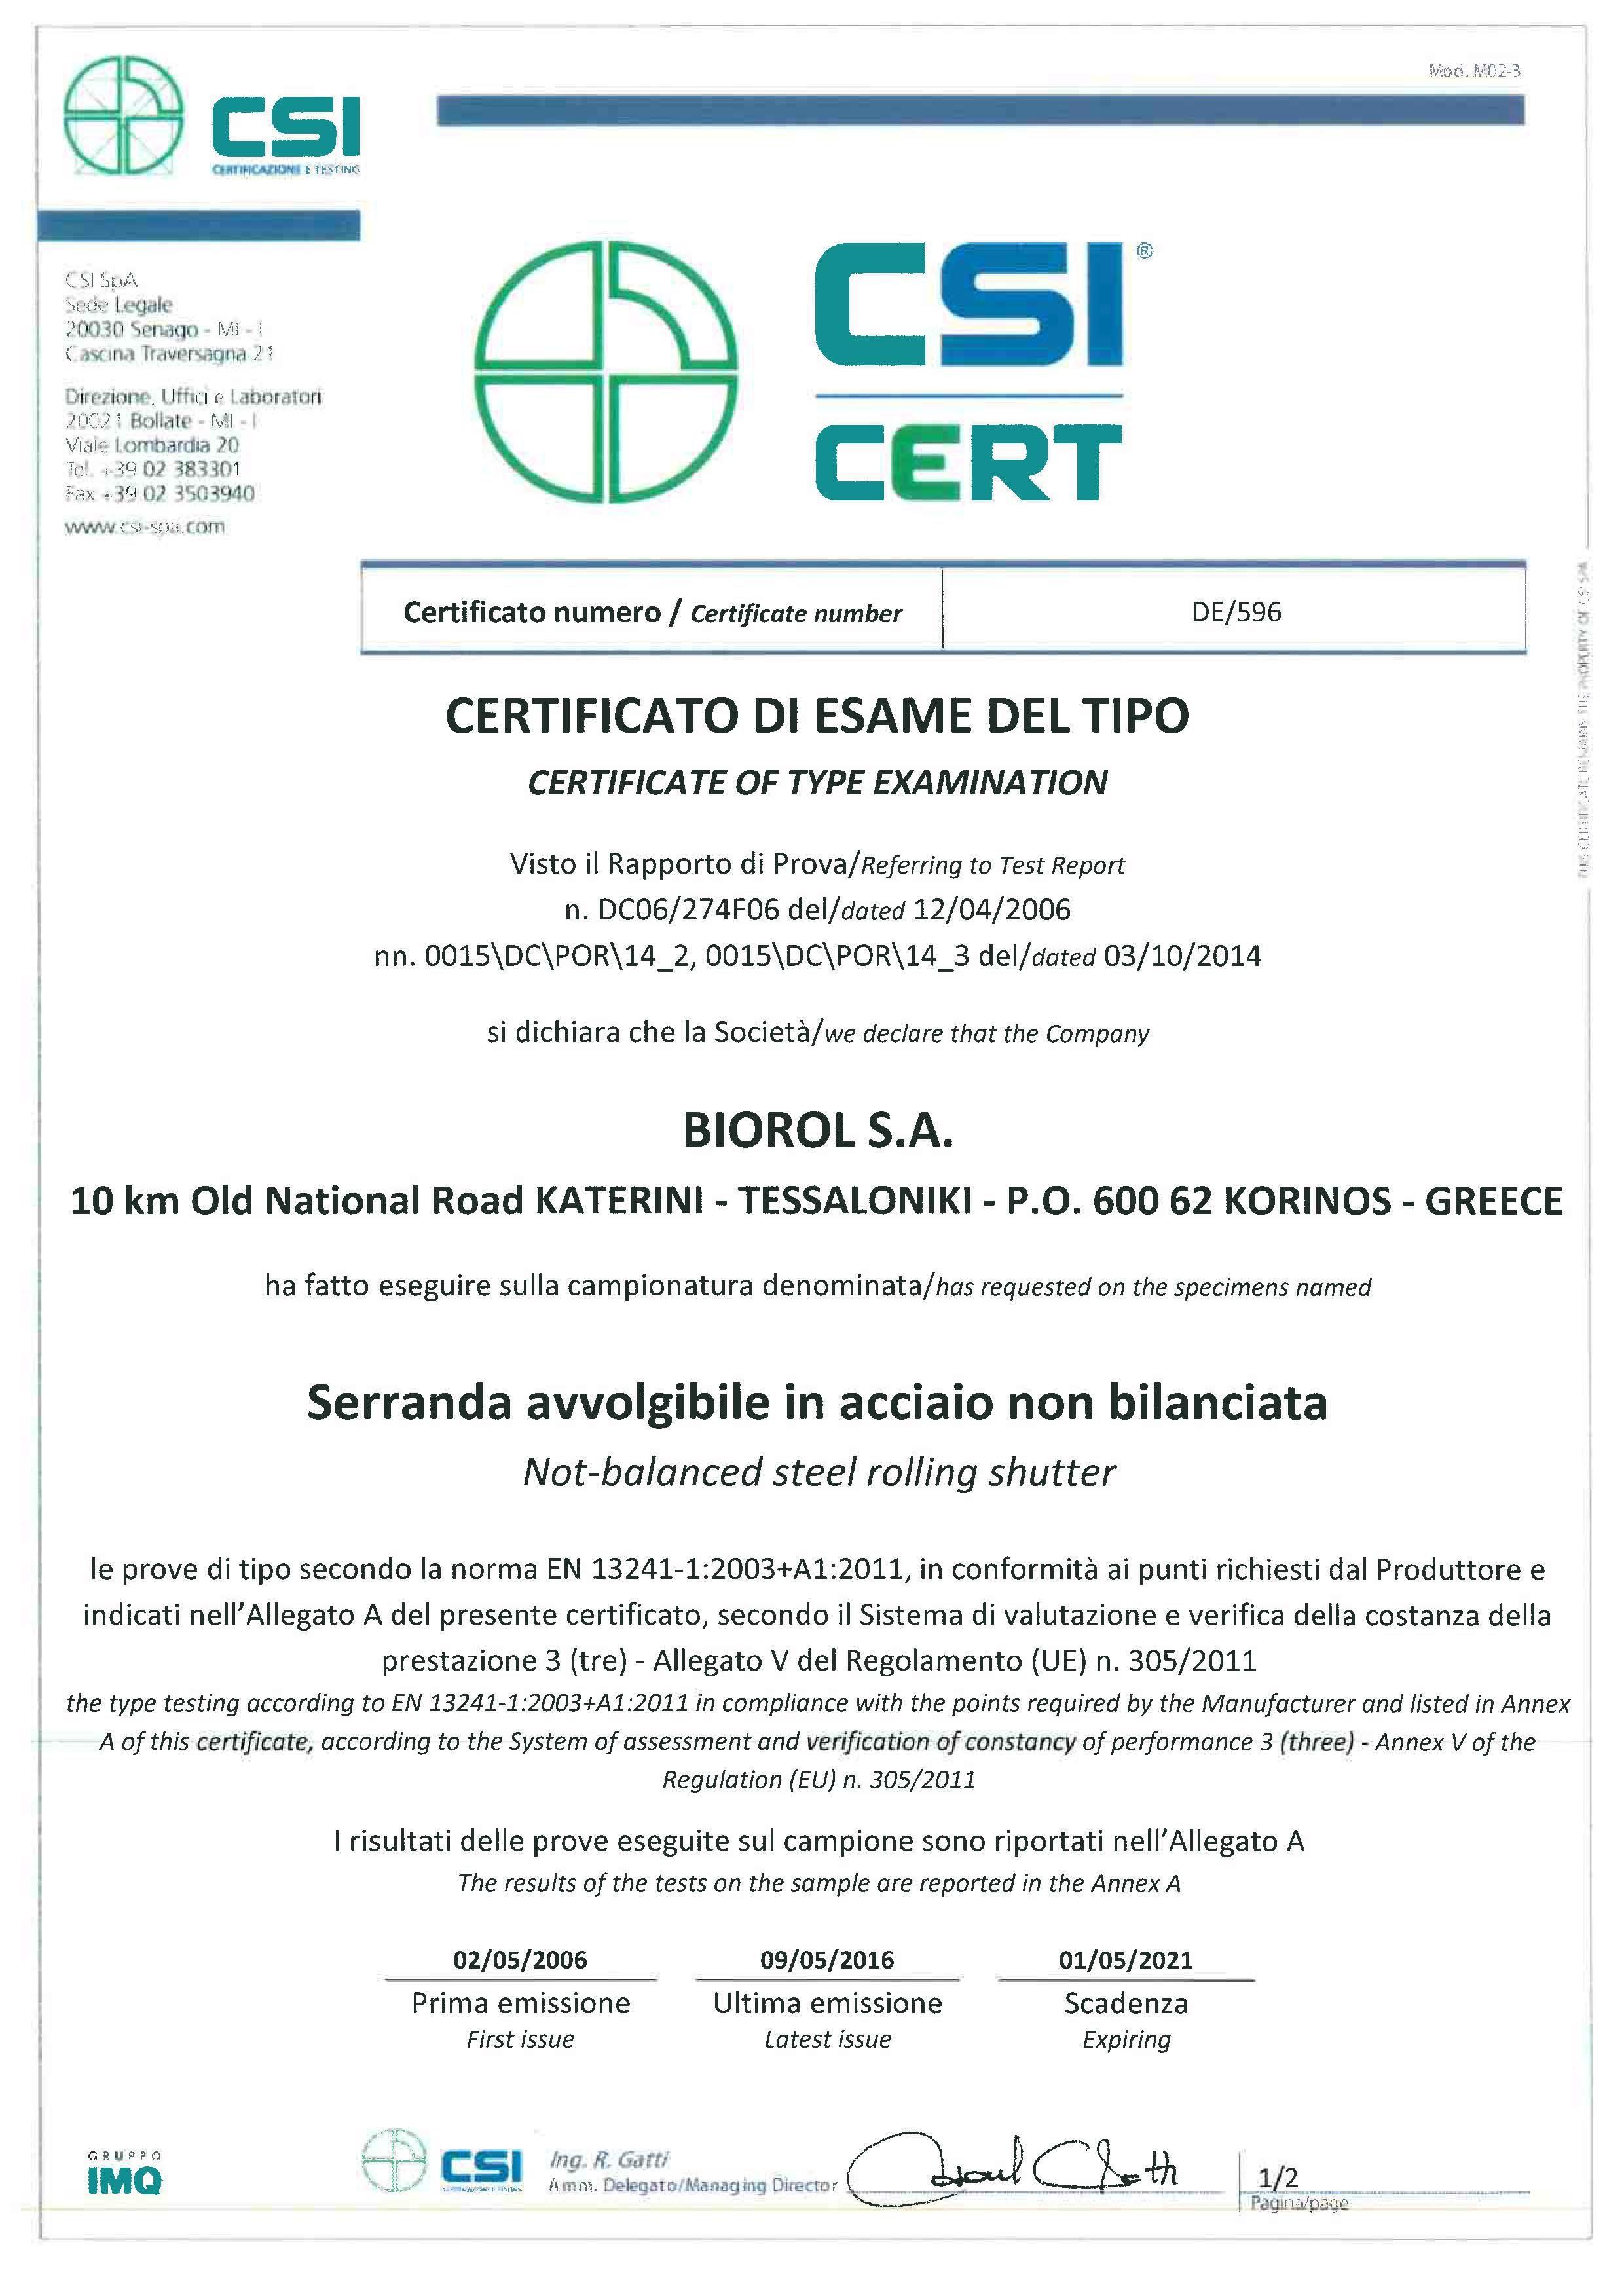 DE-596 exp01.05.2021_IRS_B113_5x5C2&B95_7x10C4&DB_7x6C3_Page_1